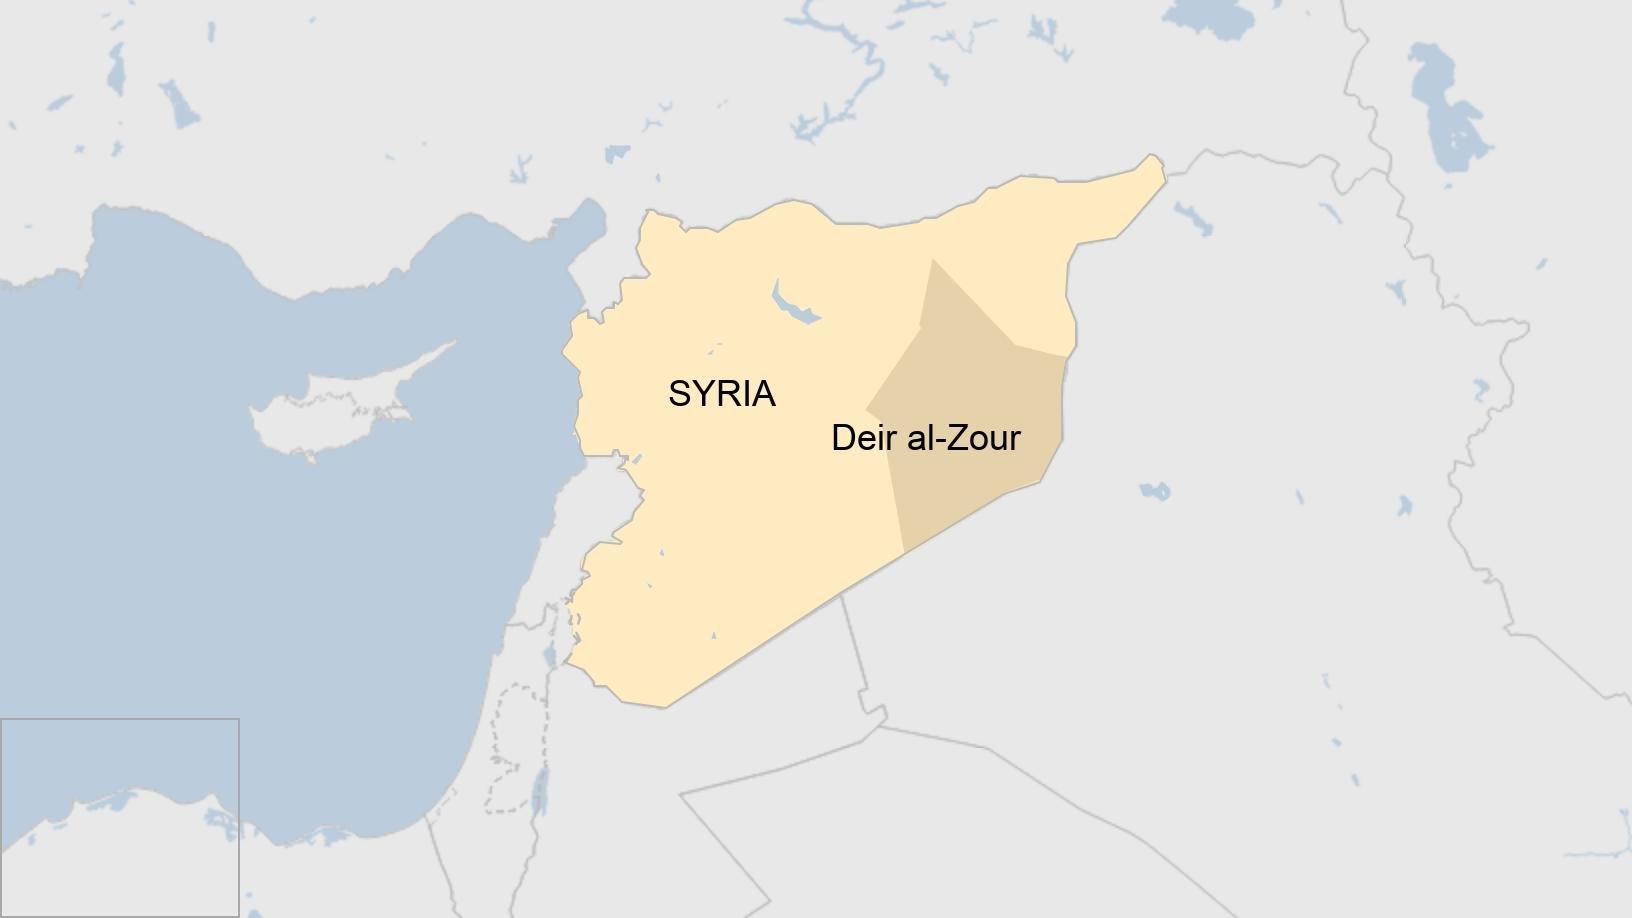 Peta Suriah timur laut